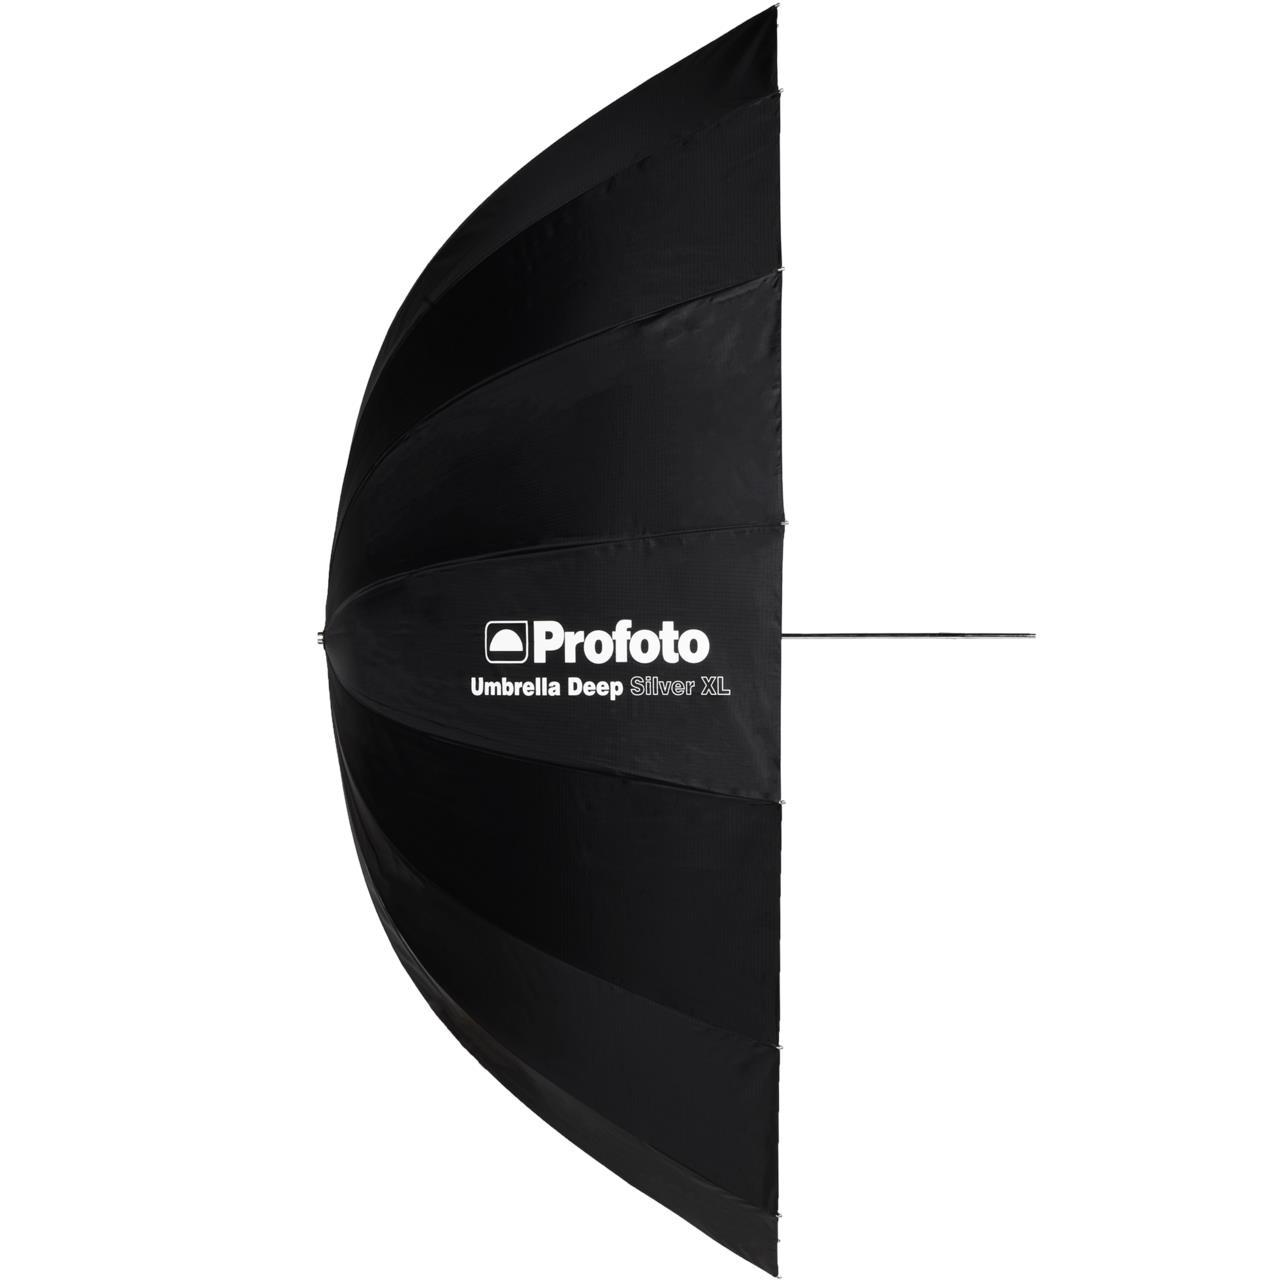 Profoto Umbrella Deep Silver XL - Profoto Umbrella Deep Silver XL, 165 cm m/ diffusjon.Pris: 120,- eks. mva